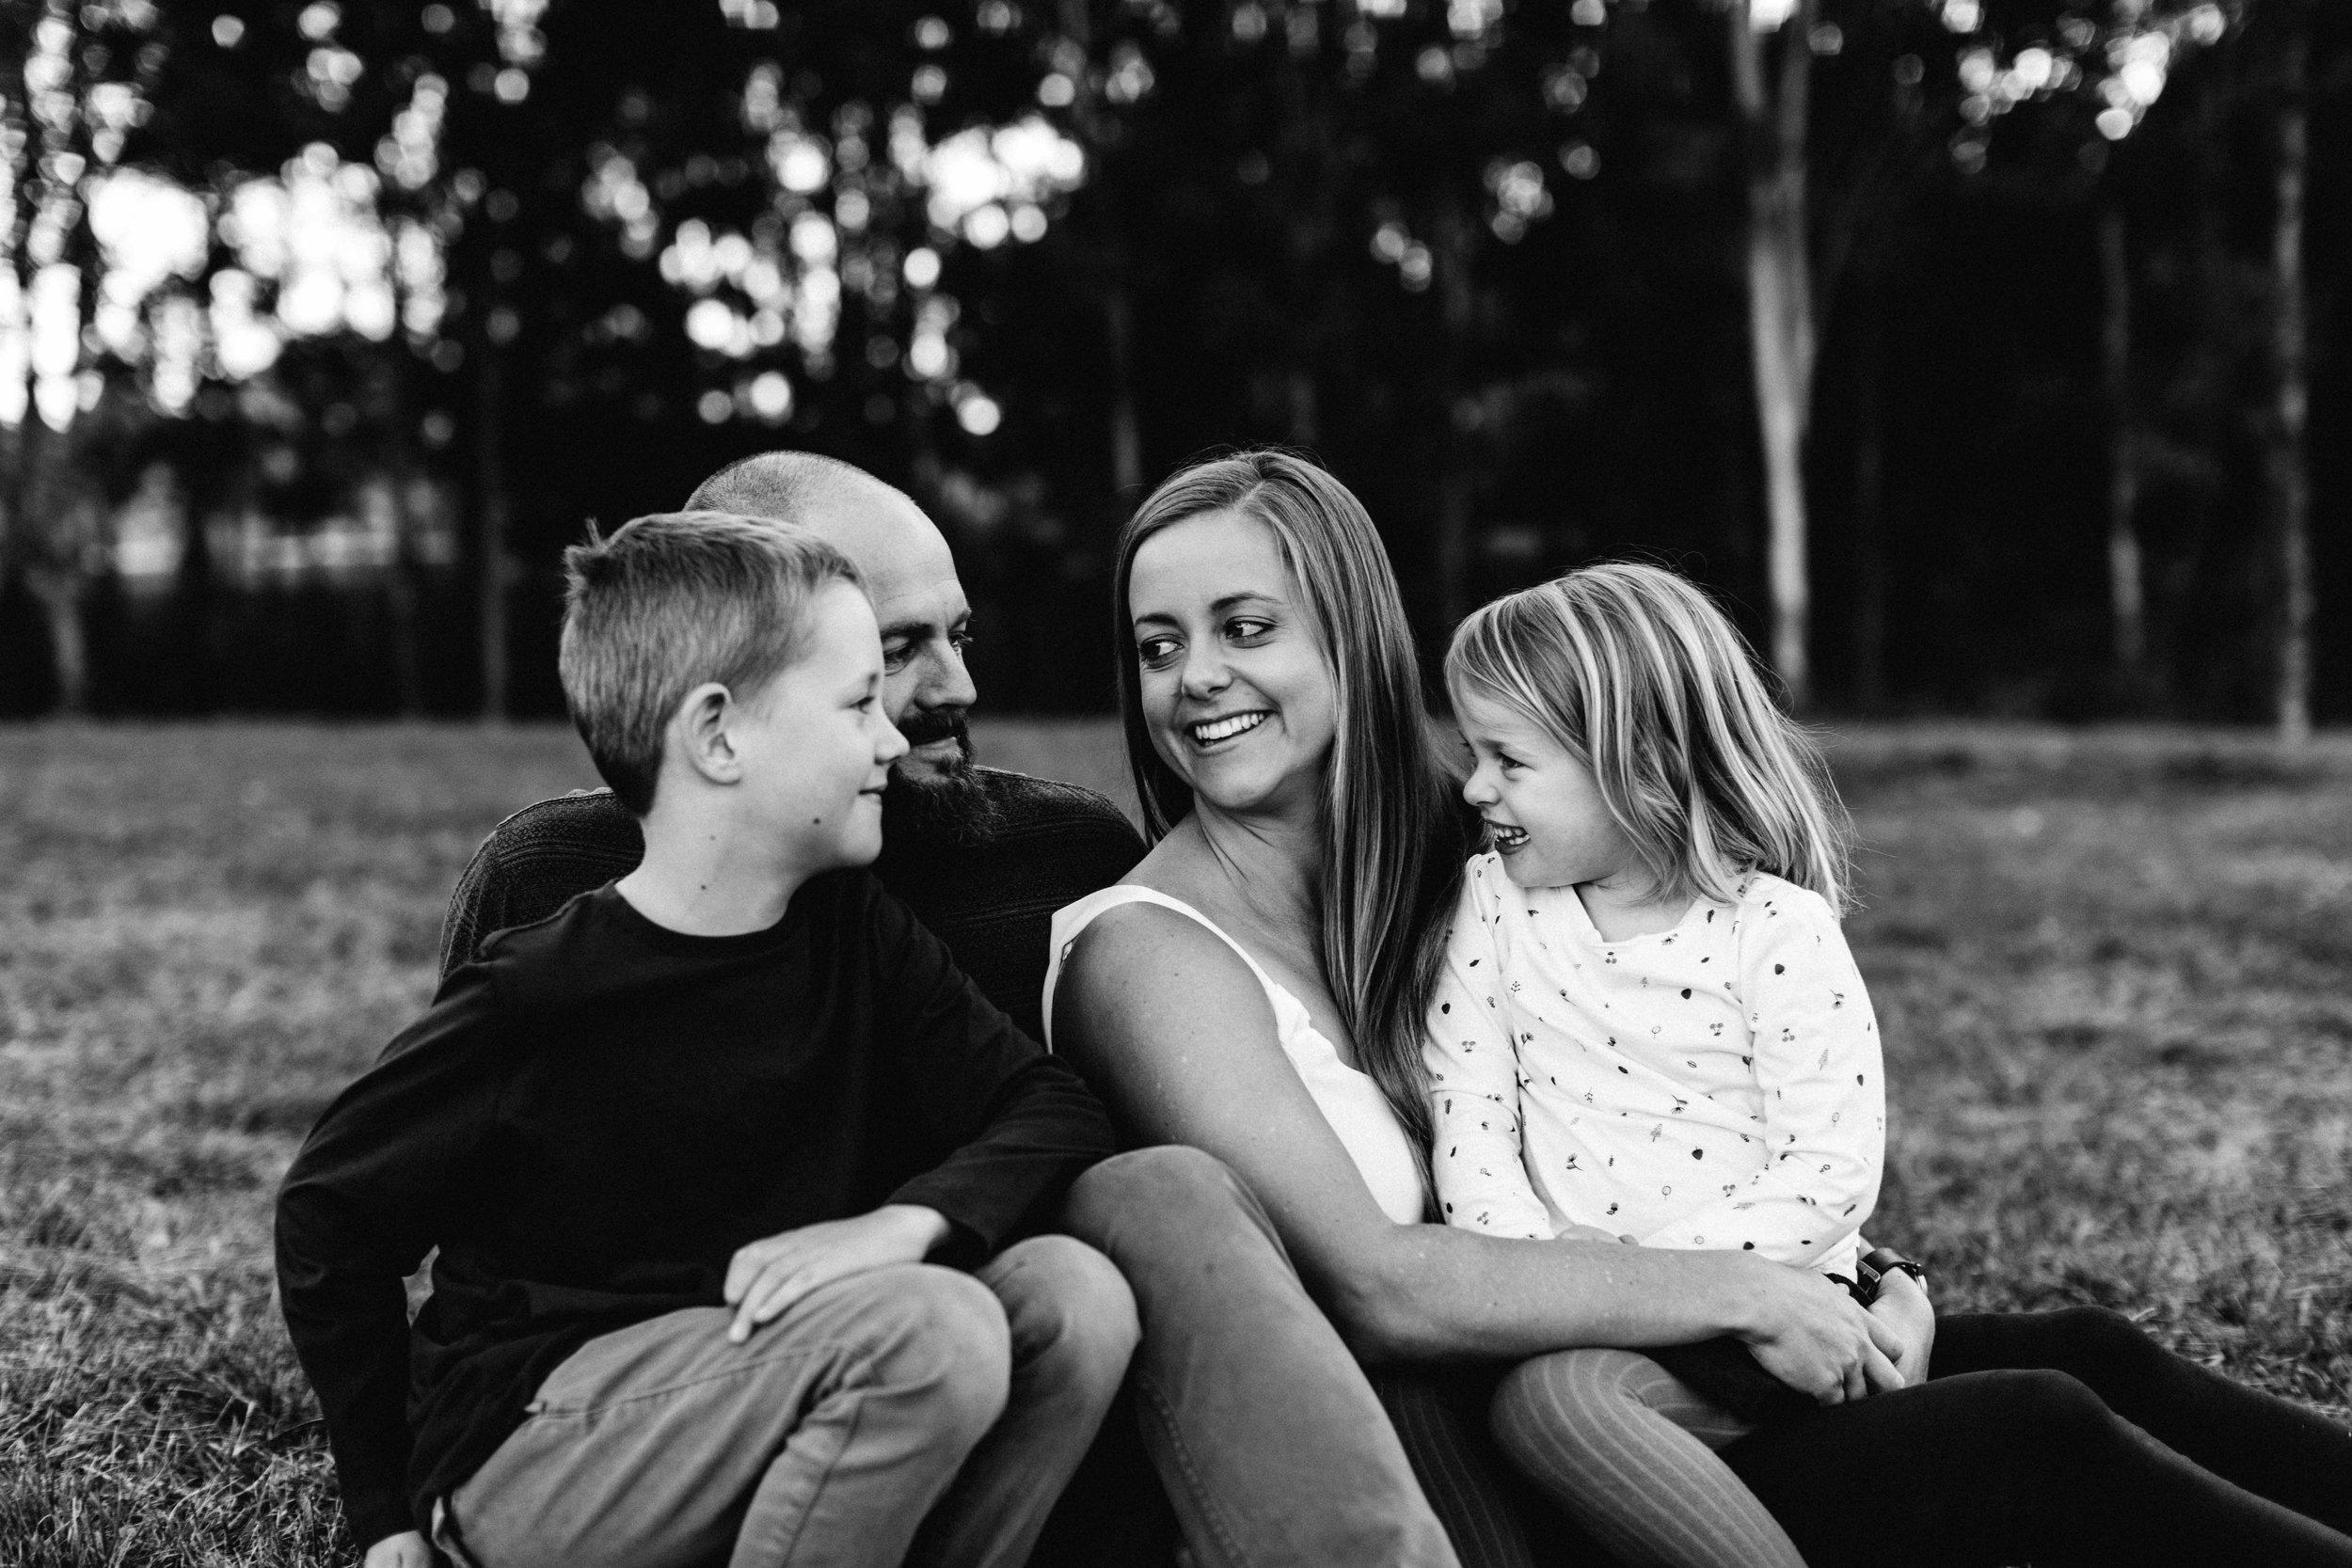 camden-family-photography-boot-family-session-33.jpg